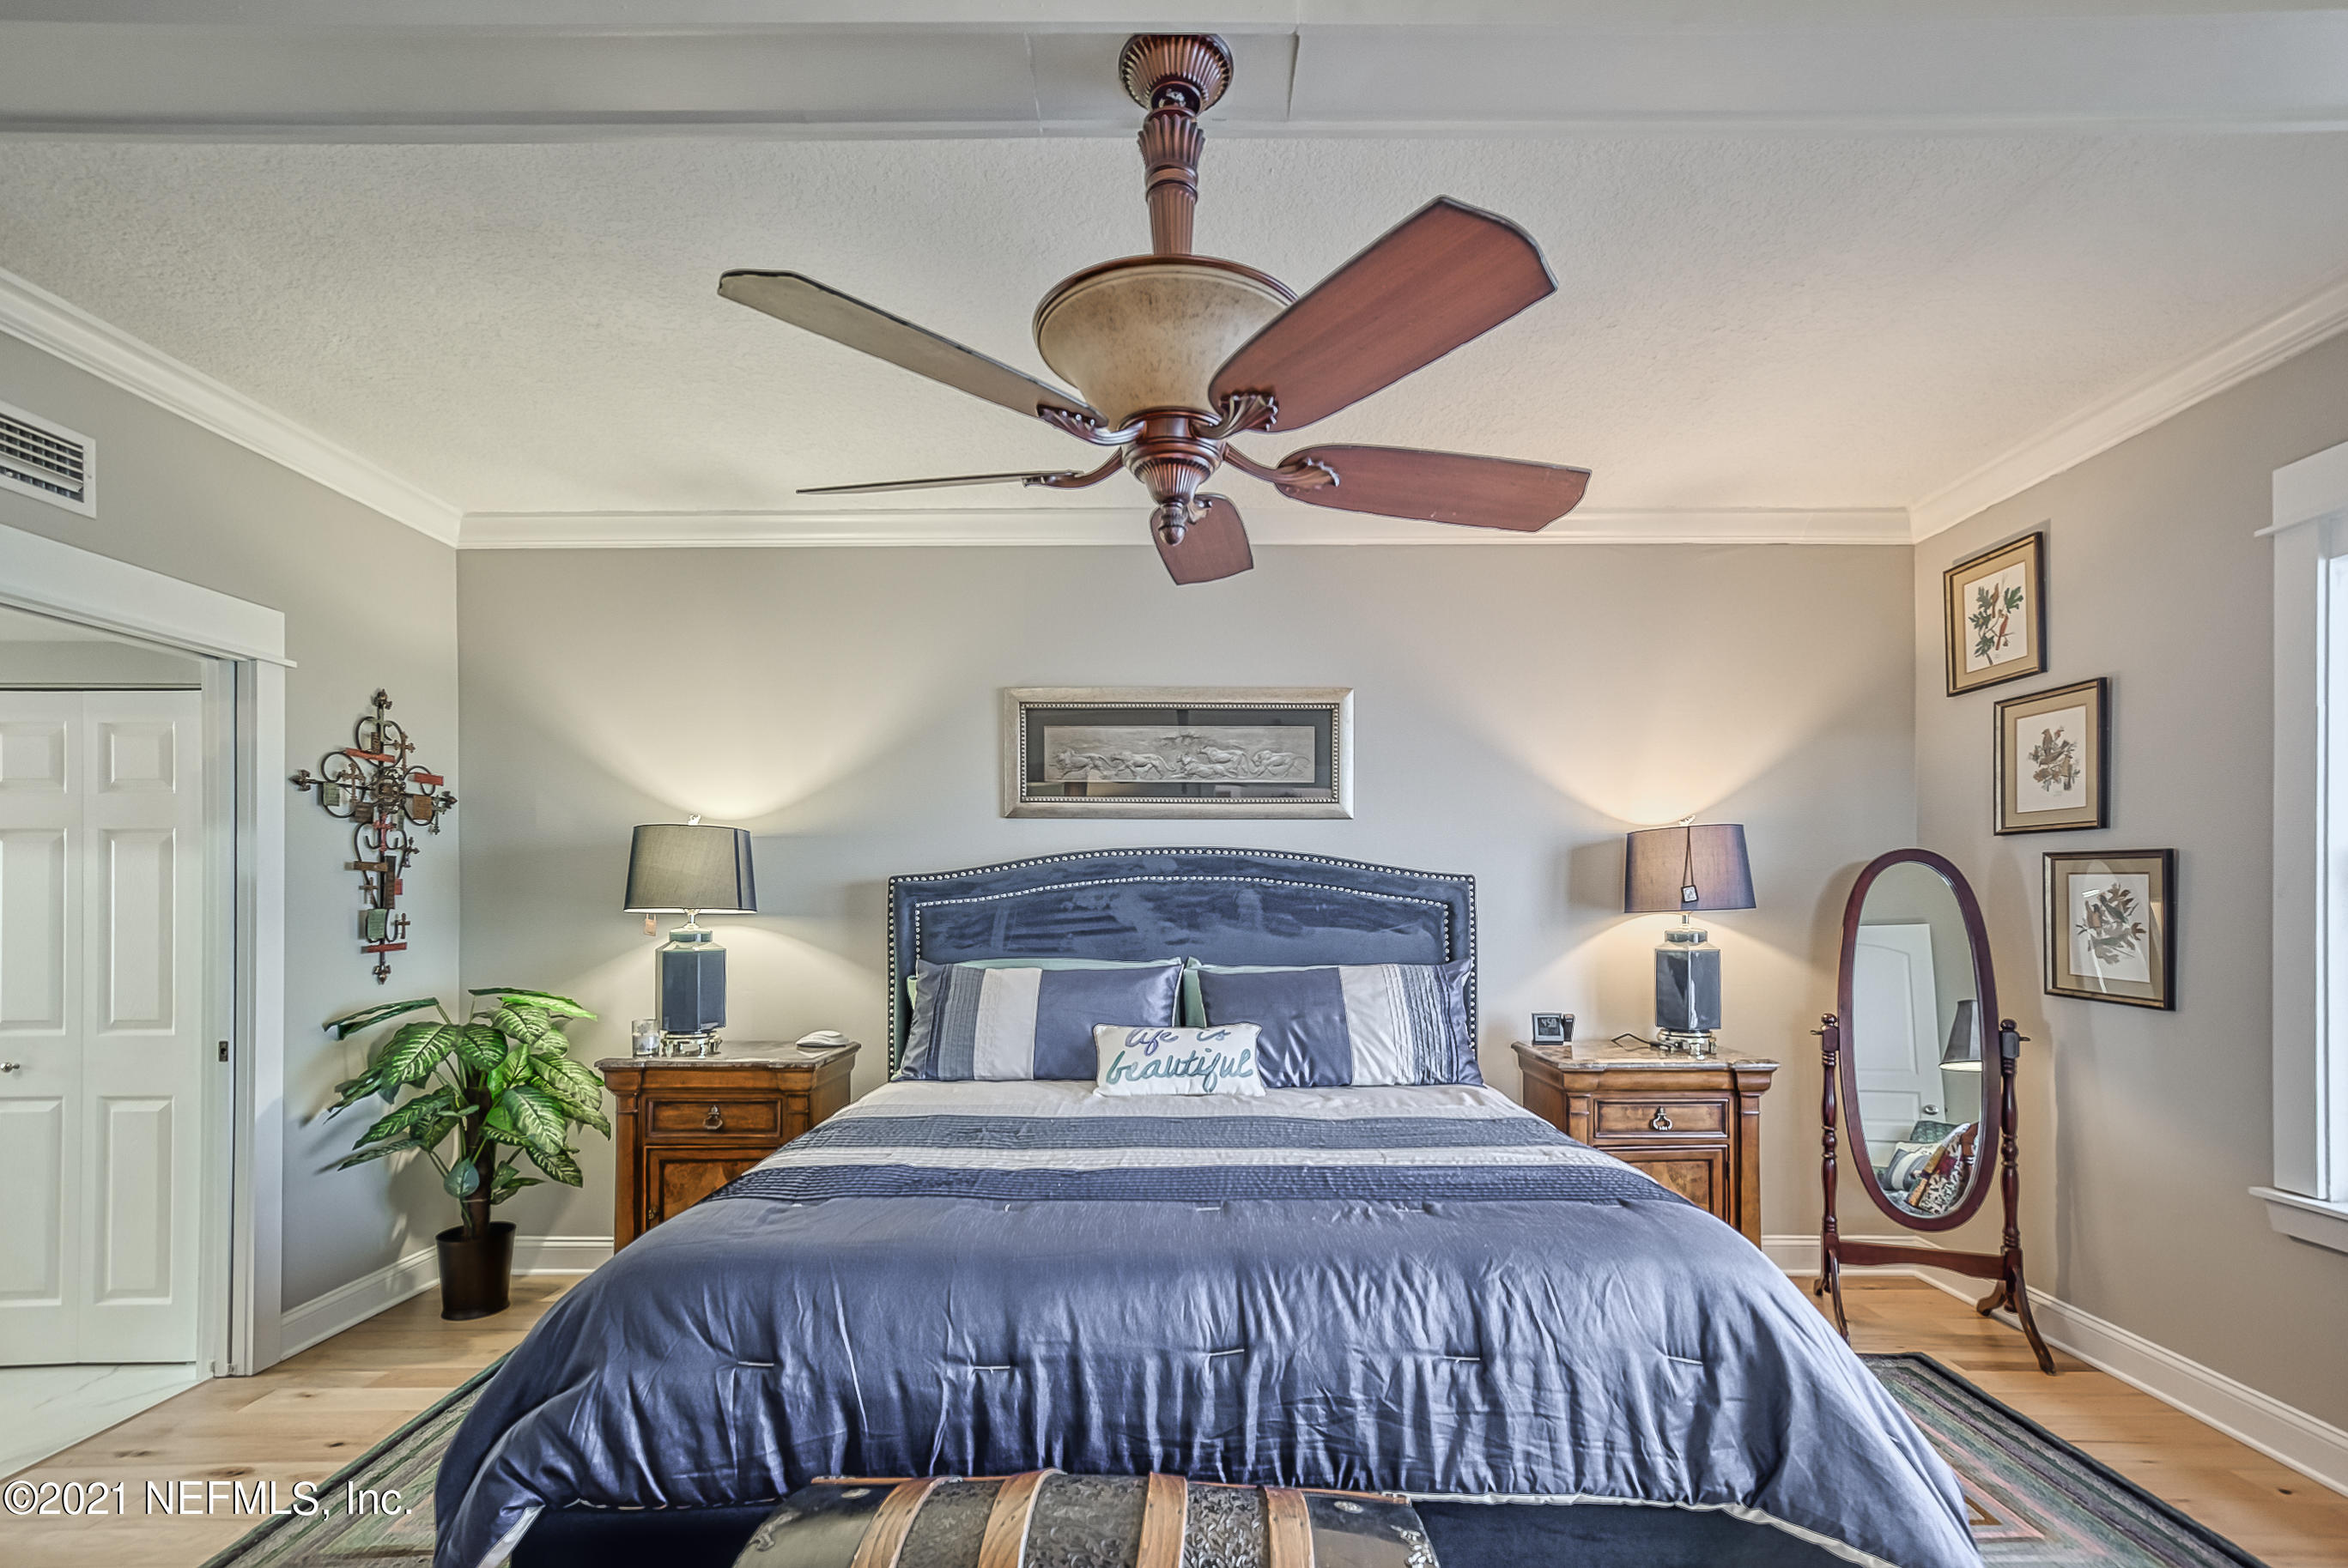 2199 ASTOR, ORANGE PARK, FLORIDA 32073, 3 Bedrooms Bedrooms, ,3 BathroomsBathrooms,Residential,For sale,ASTOR,1108526